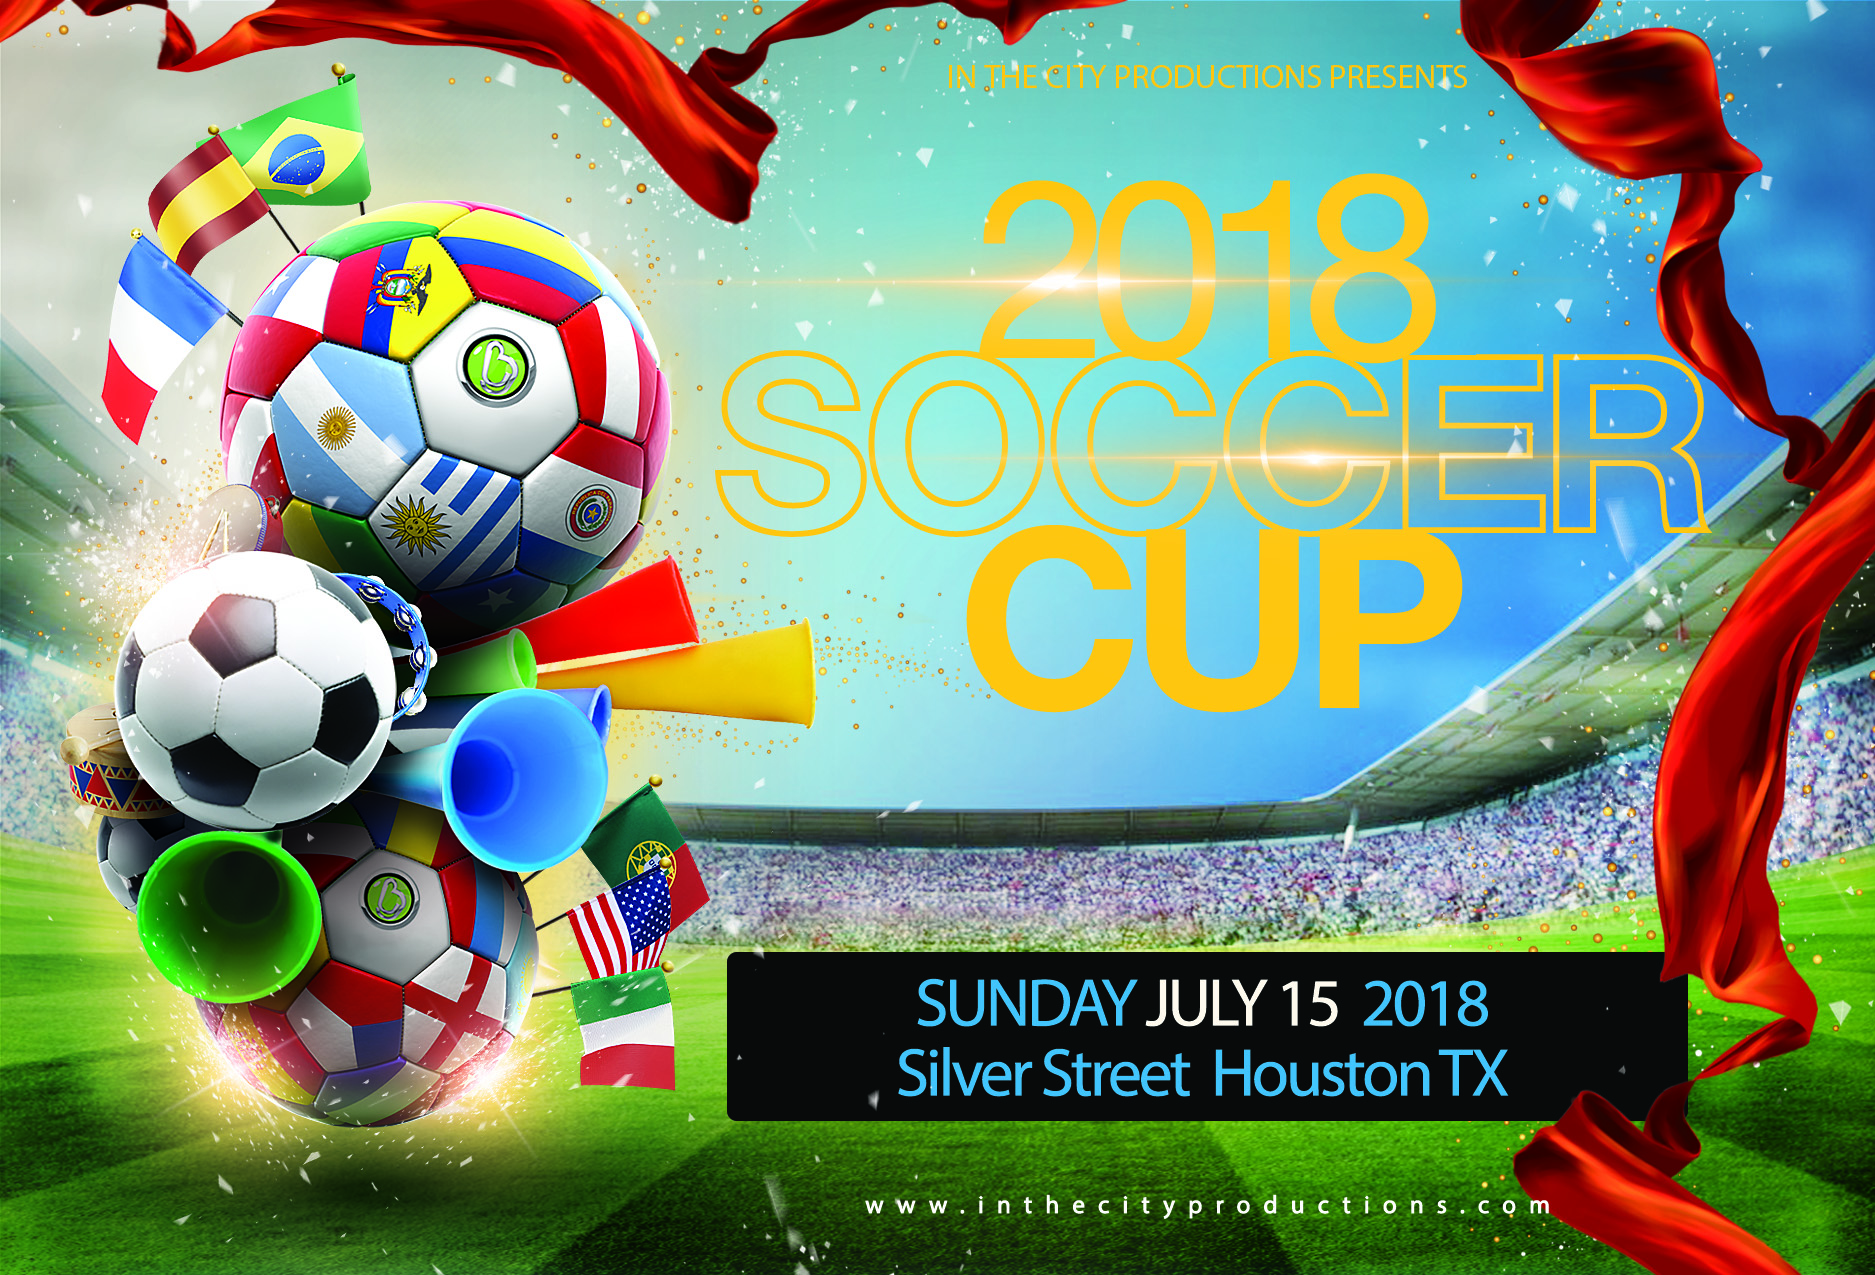 2014 Soccer Cup Flyer 02.jpg